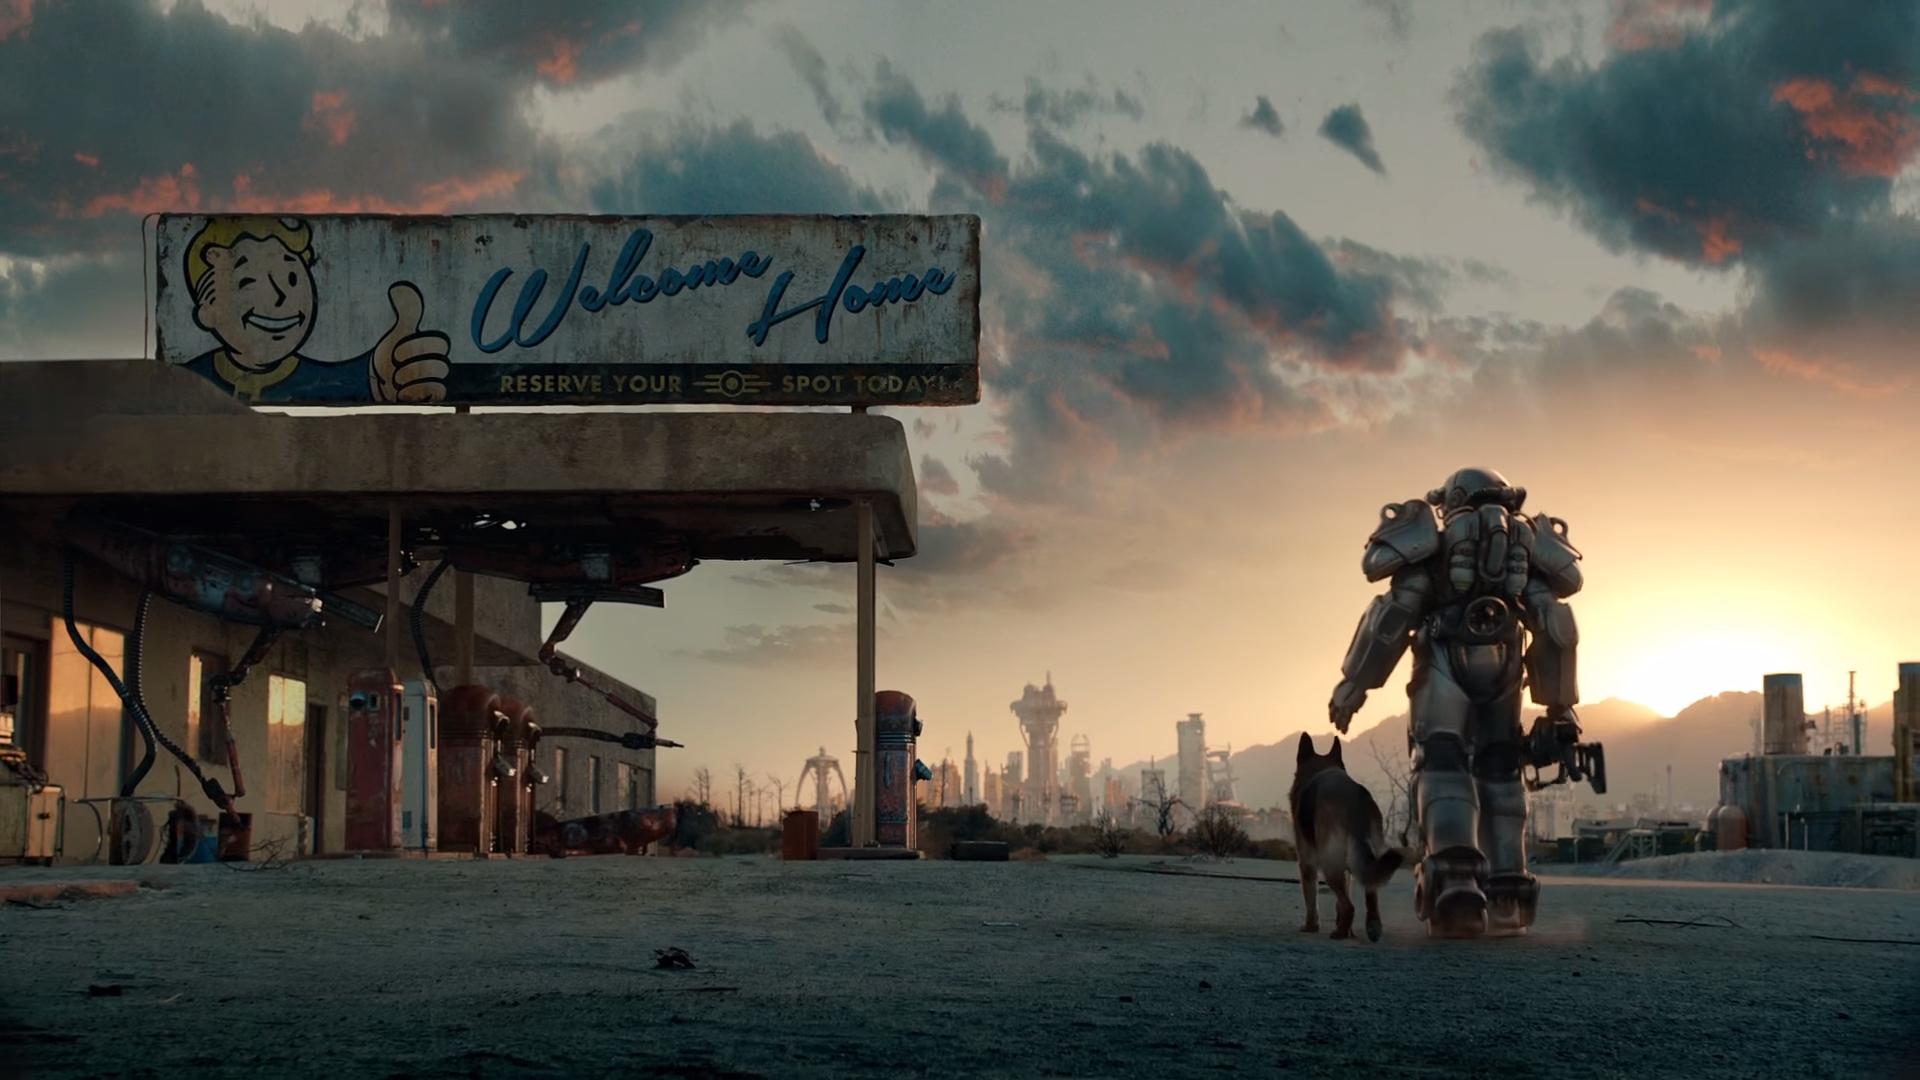 Fallout 4 Desktop Wallpapers Fallout Wallpaper Fallout 4 Wallpapers Fallout Art